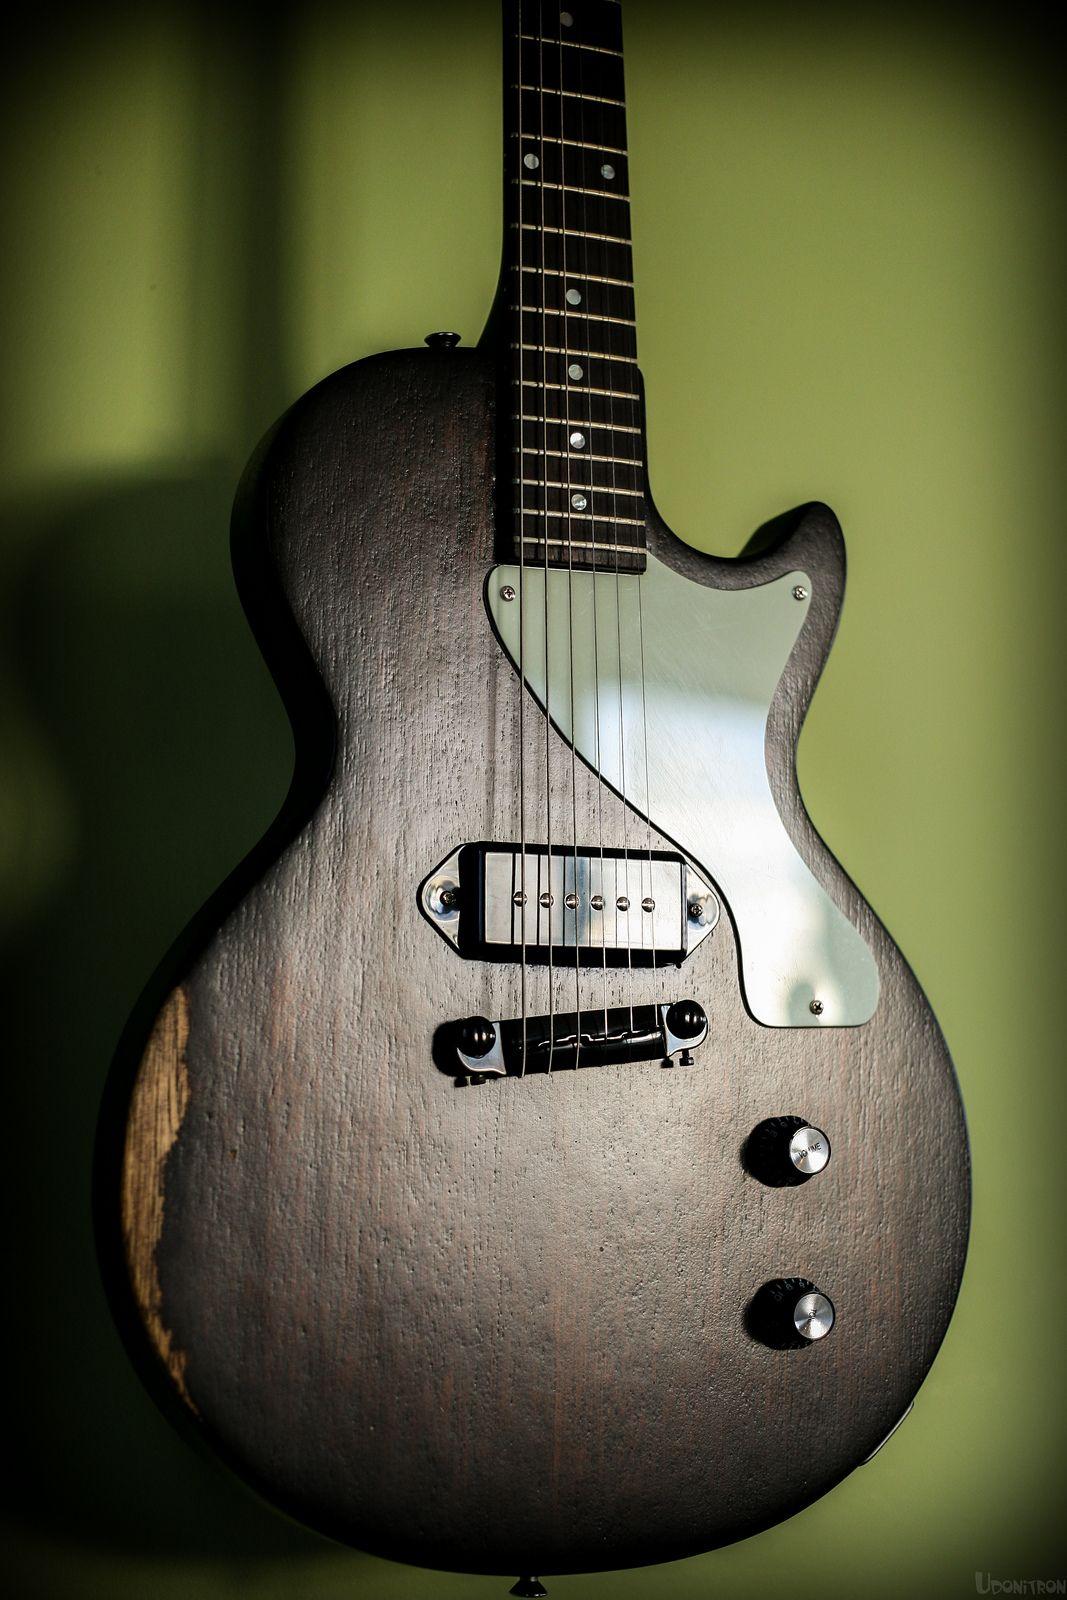 1978 MIJ Les Paul Junior | Gibson les paul | Guitar, Gibson